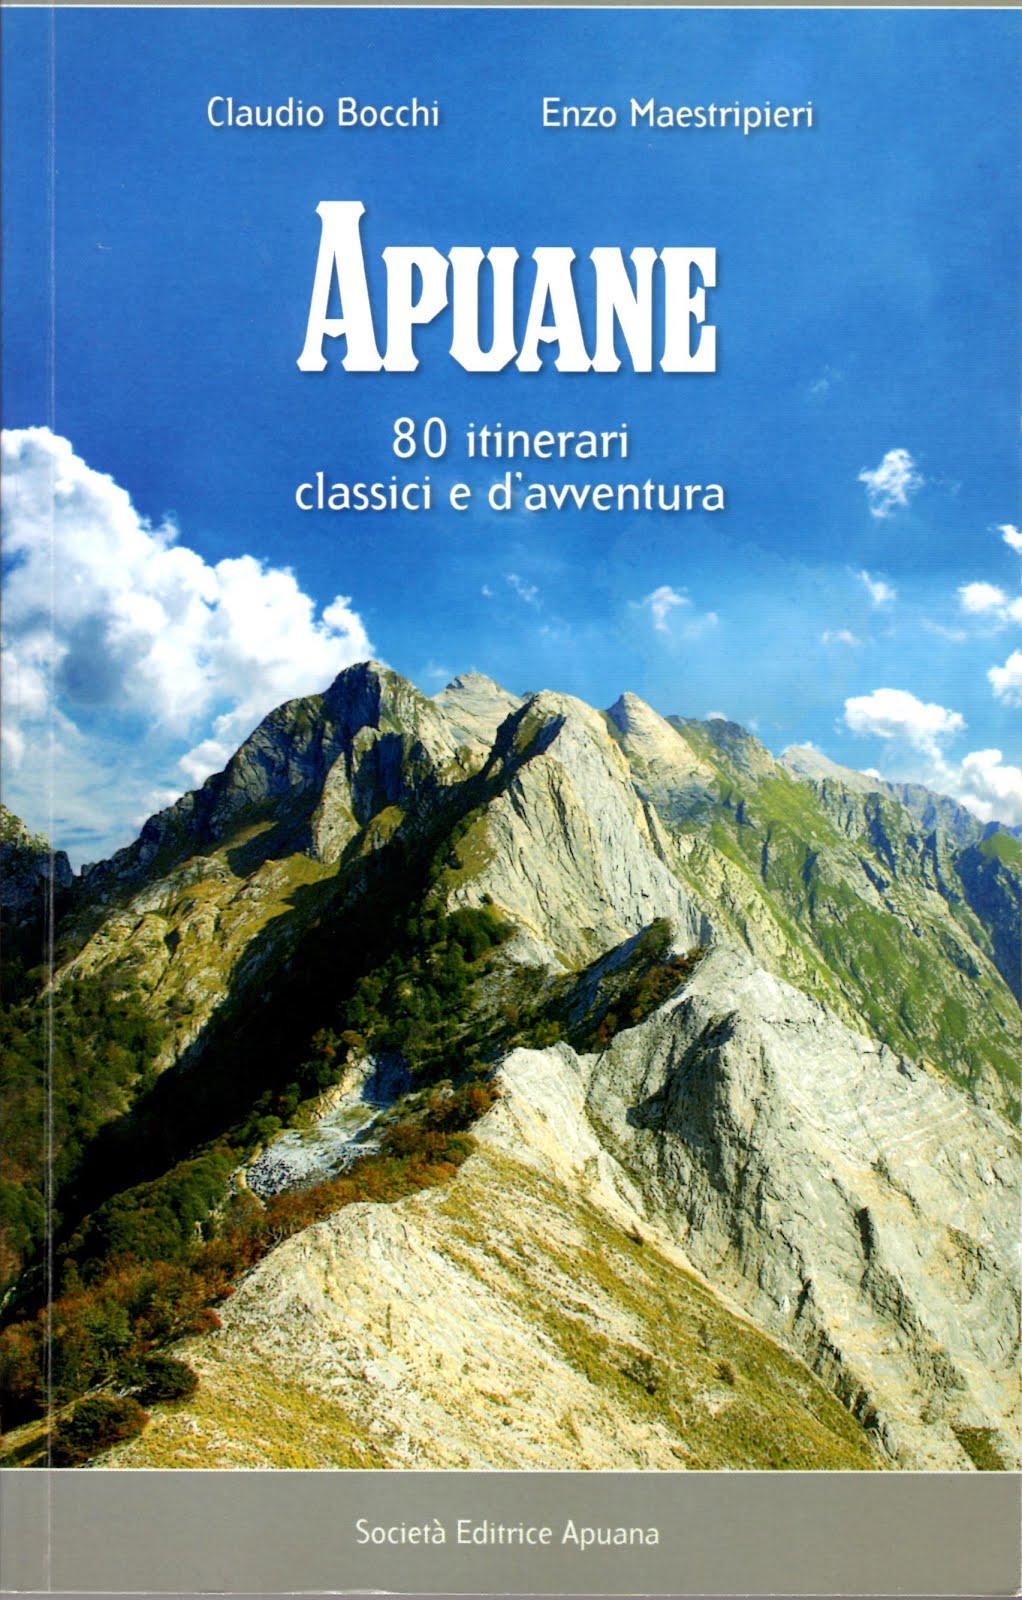 Nuova Guida Apuane 80 itinerari classici e d'avventura